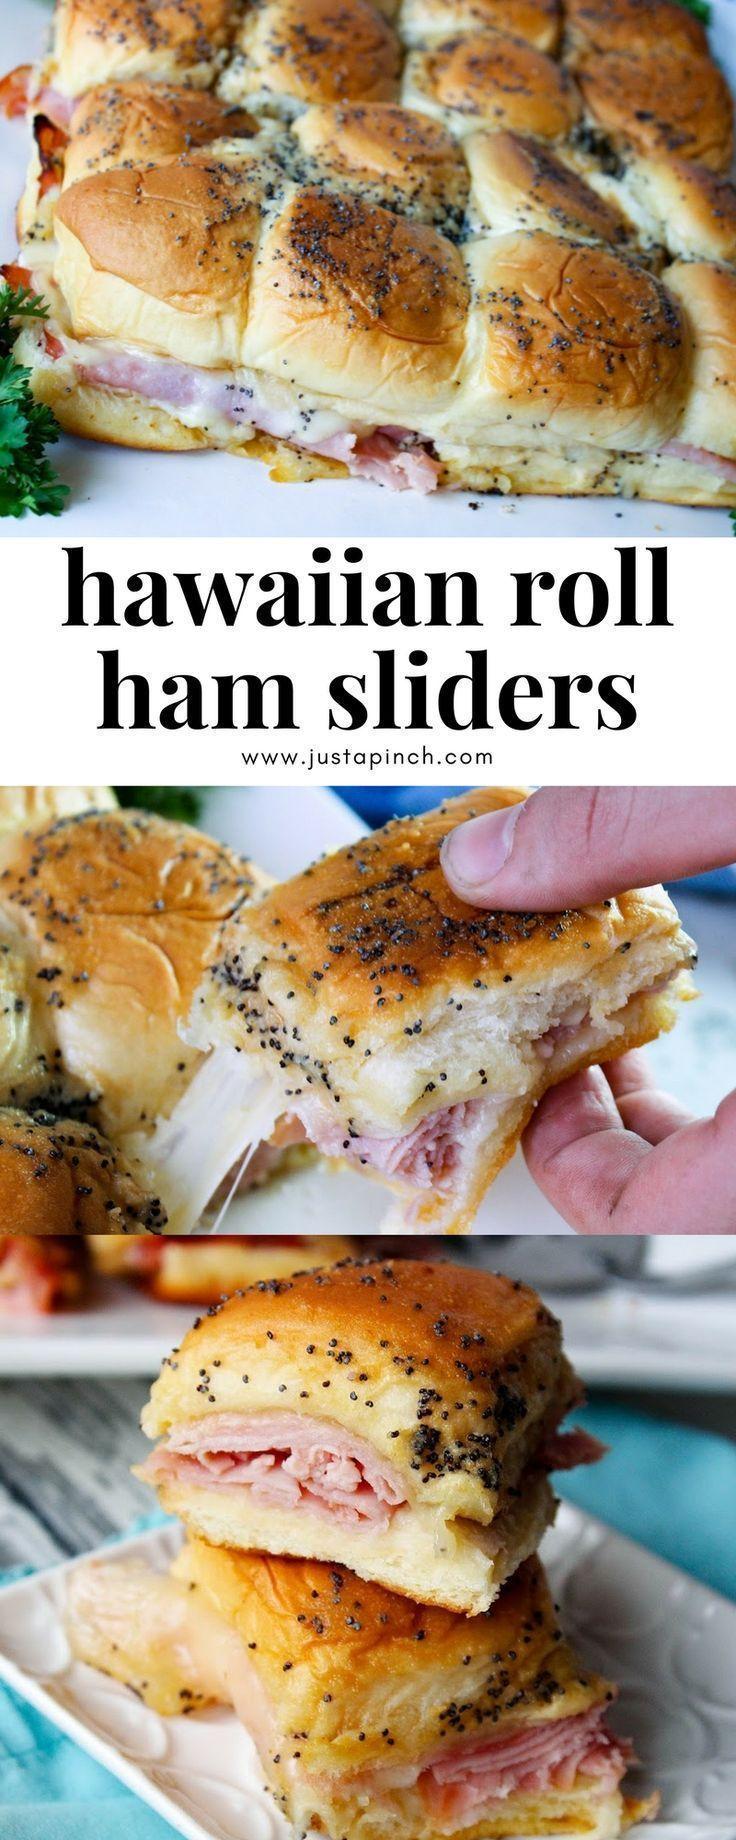 Hawaiian Roll Ham Sliders #appetizersforparty